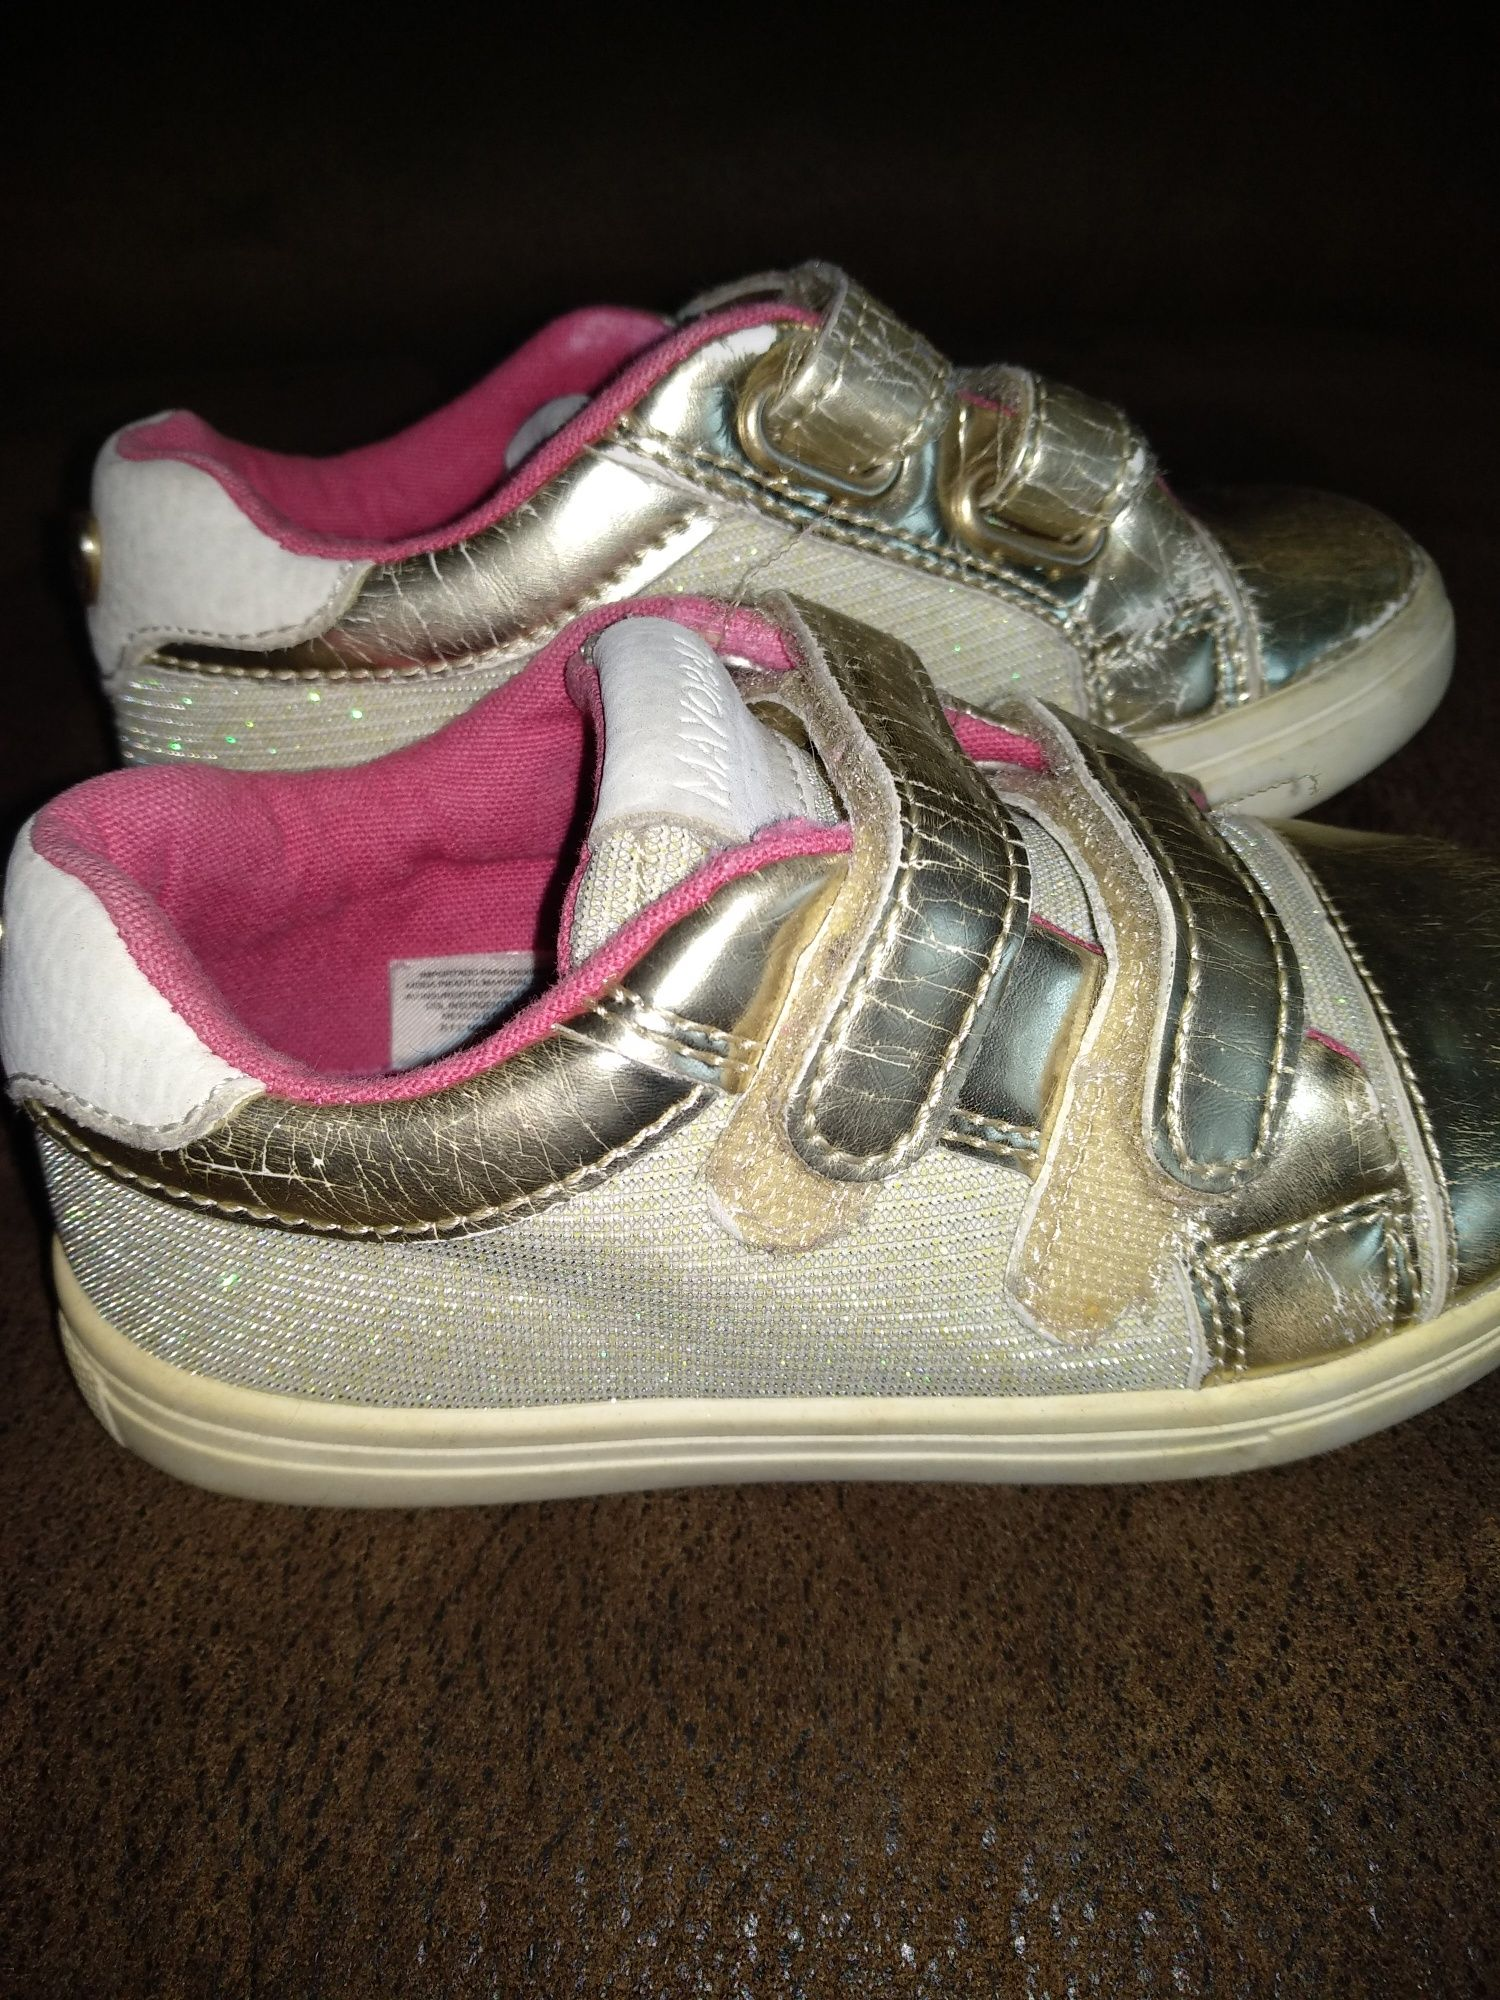 Sapatilhas de menina 25